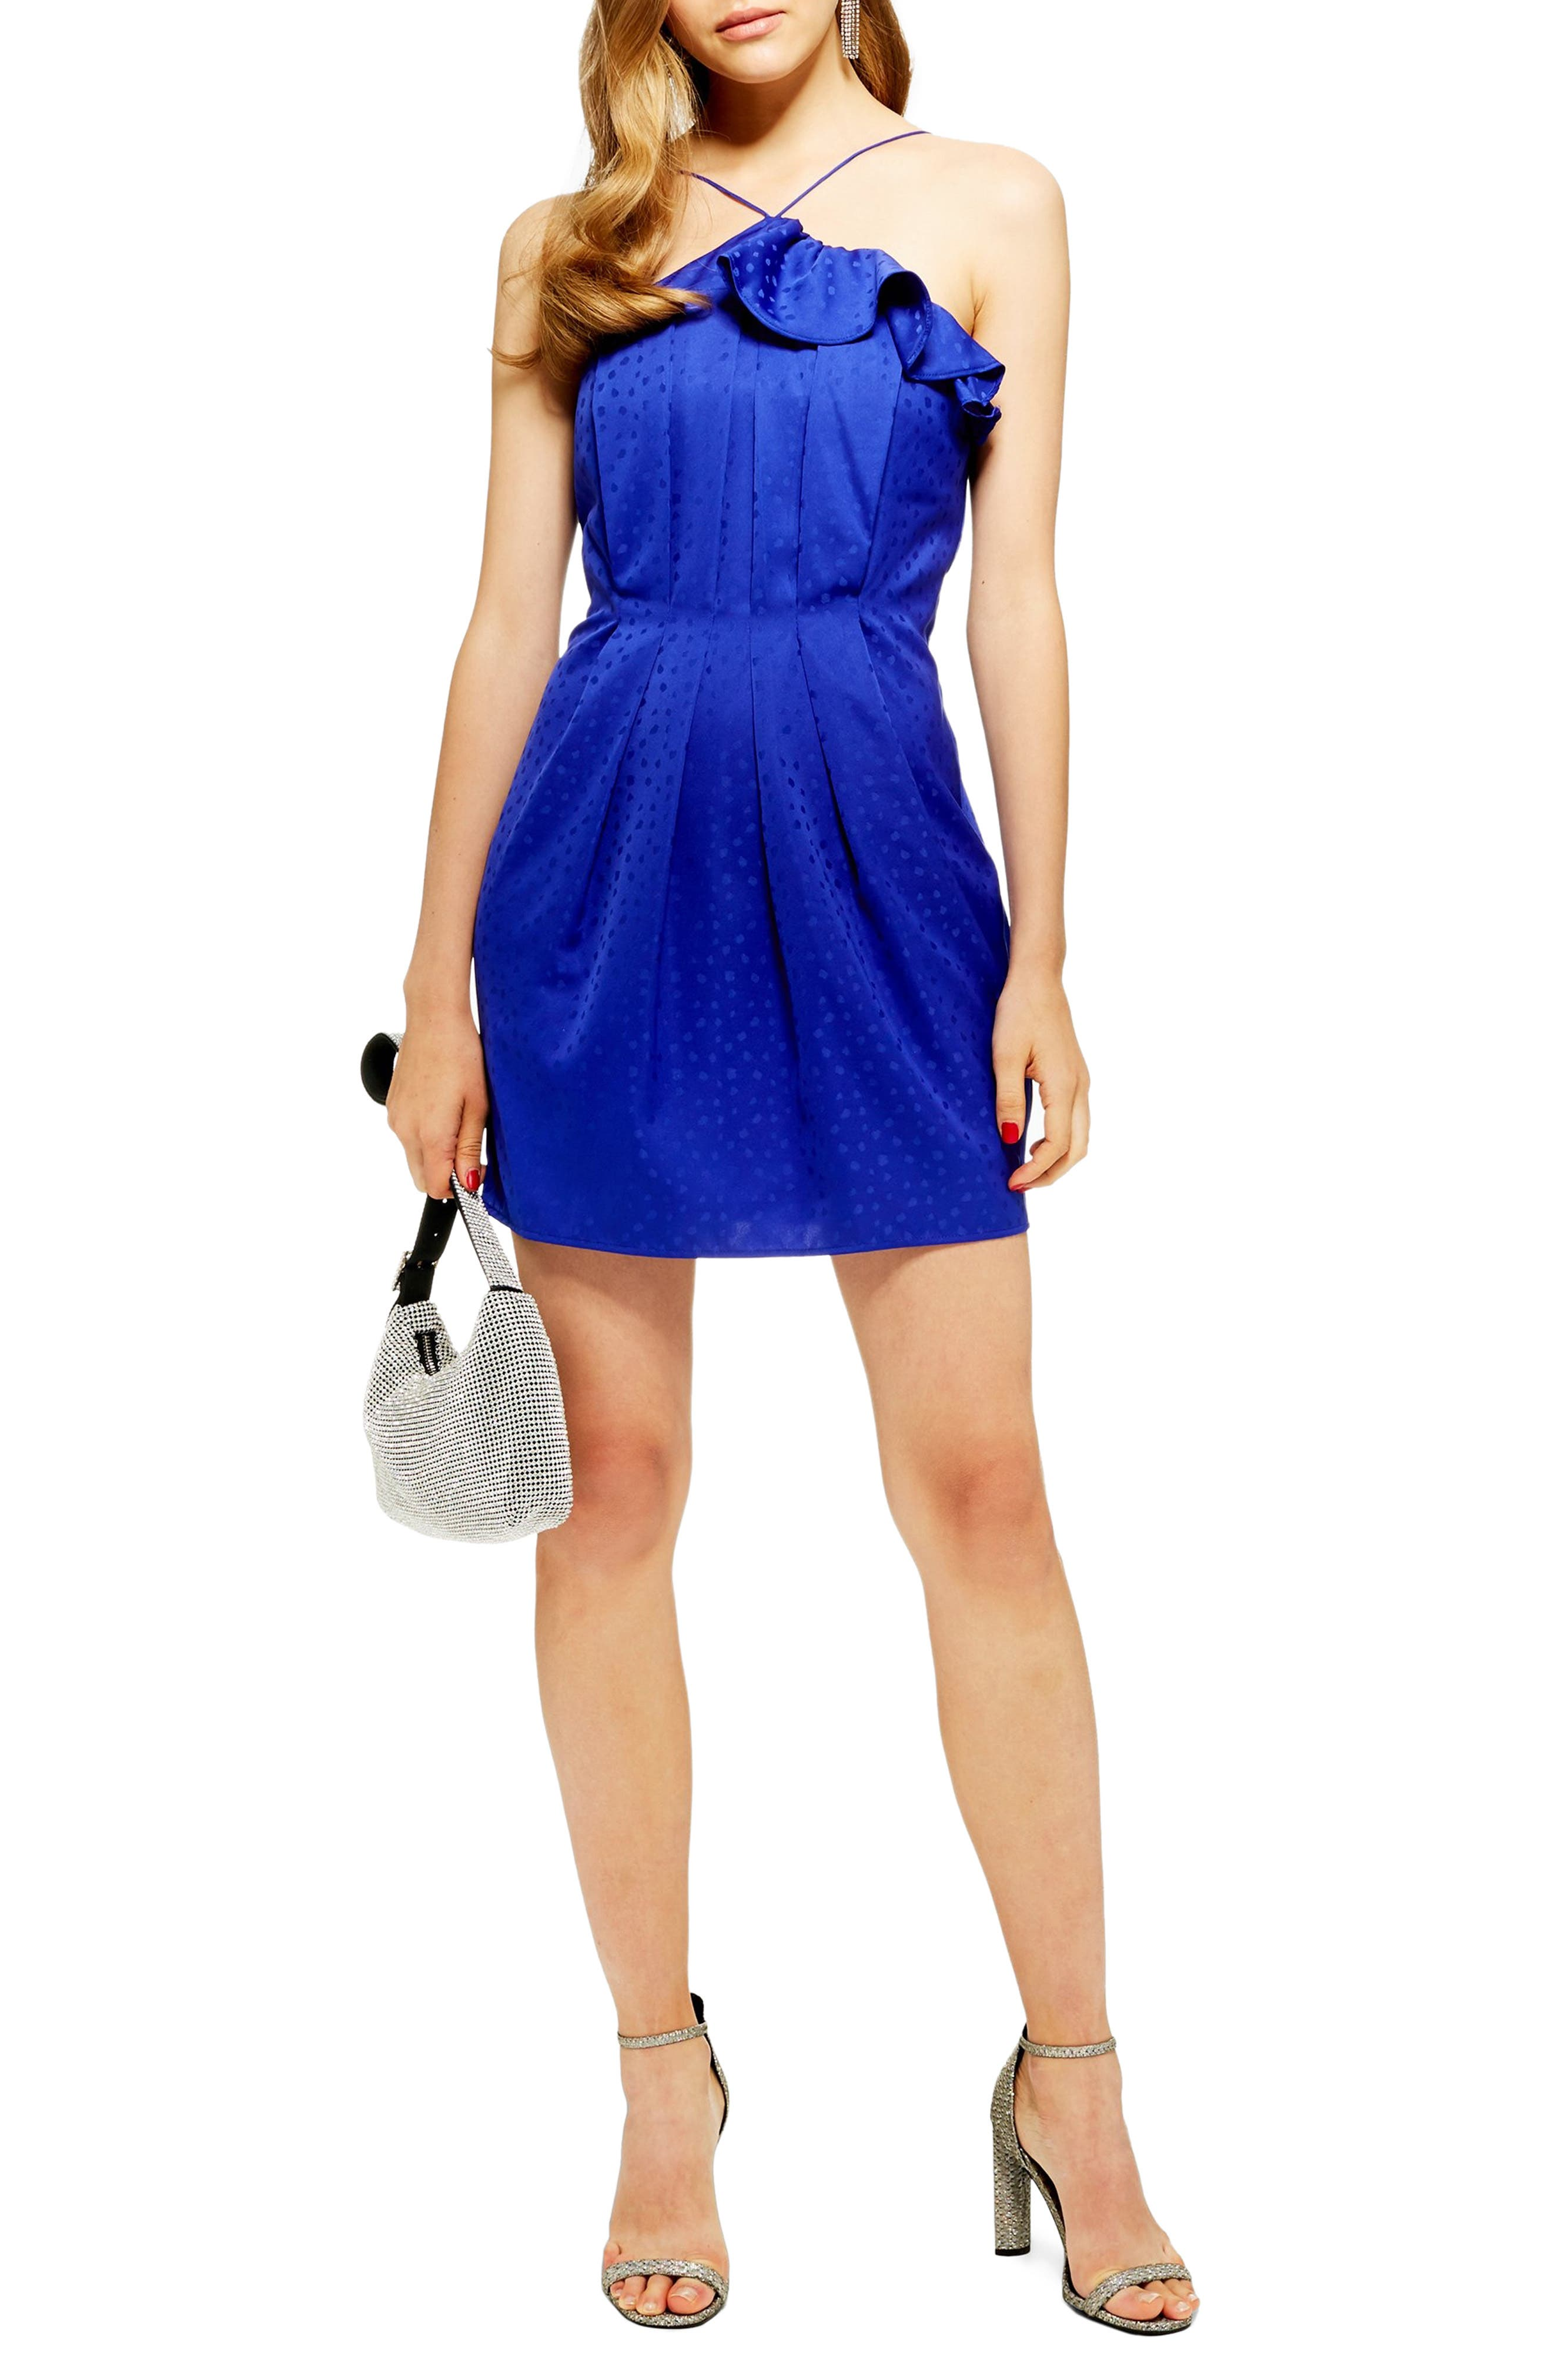 TOPSHOP Frill Jacquard Minidress, Main, color, 460